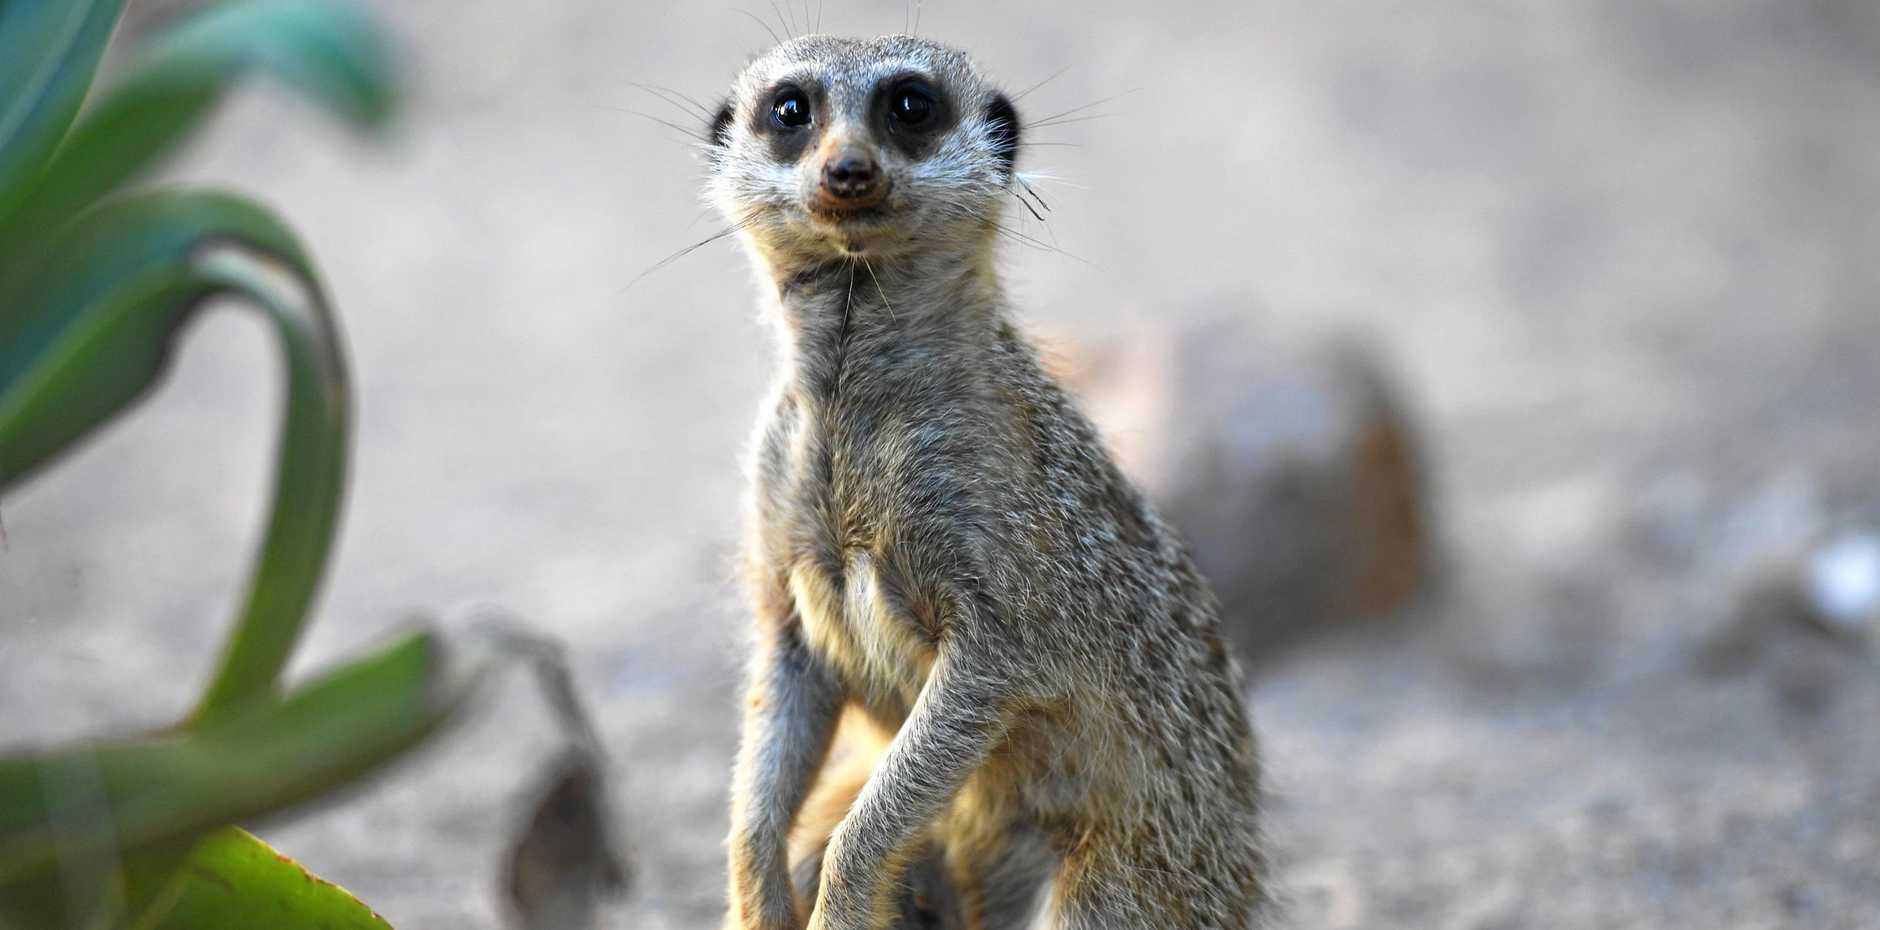 Meerkats at Snakes Downunder.